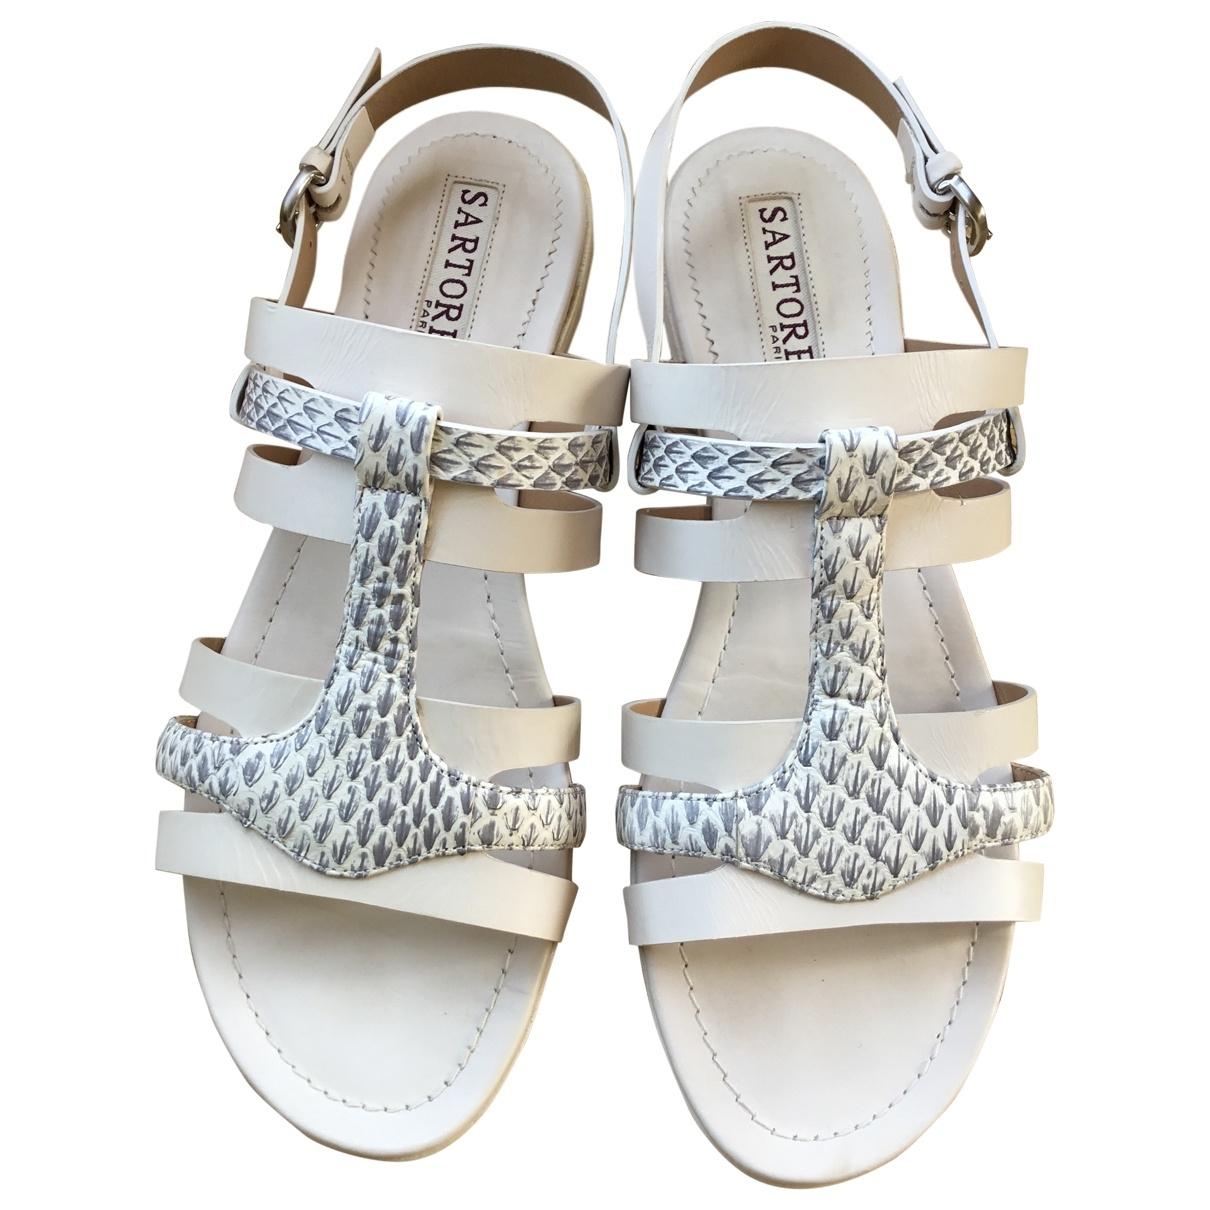 Sartore \N Beige Leather Sandals for Women 37 EU